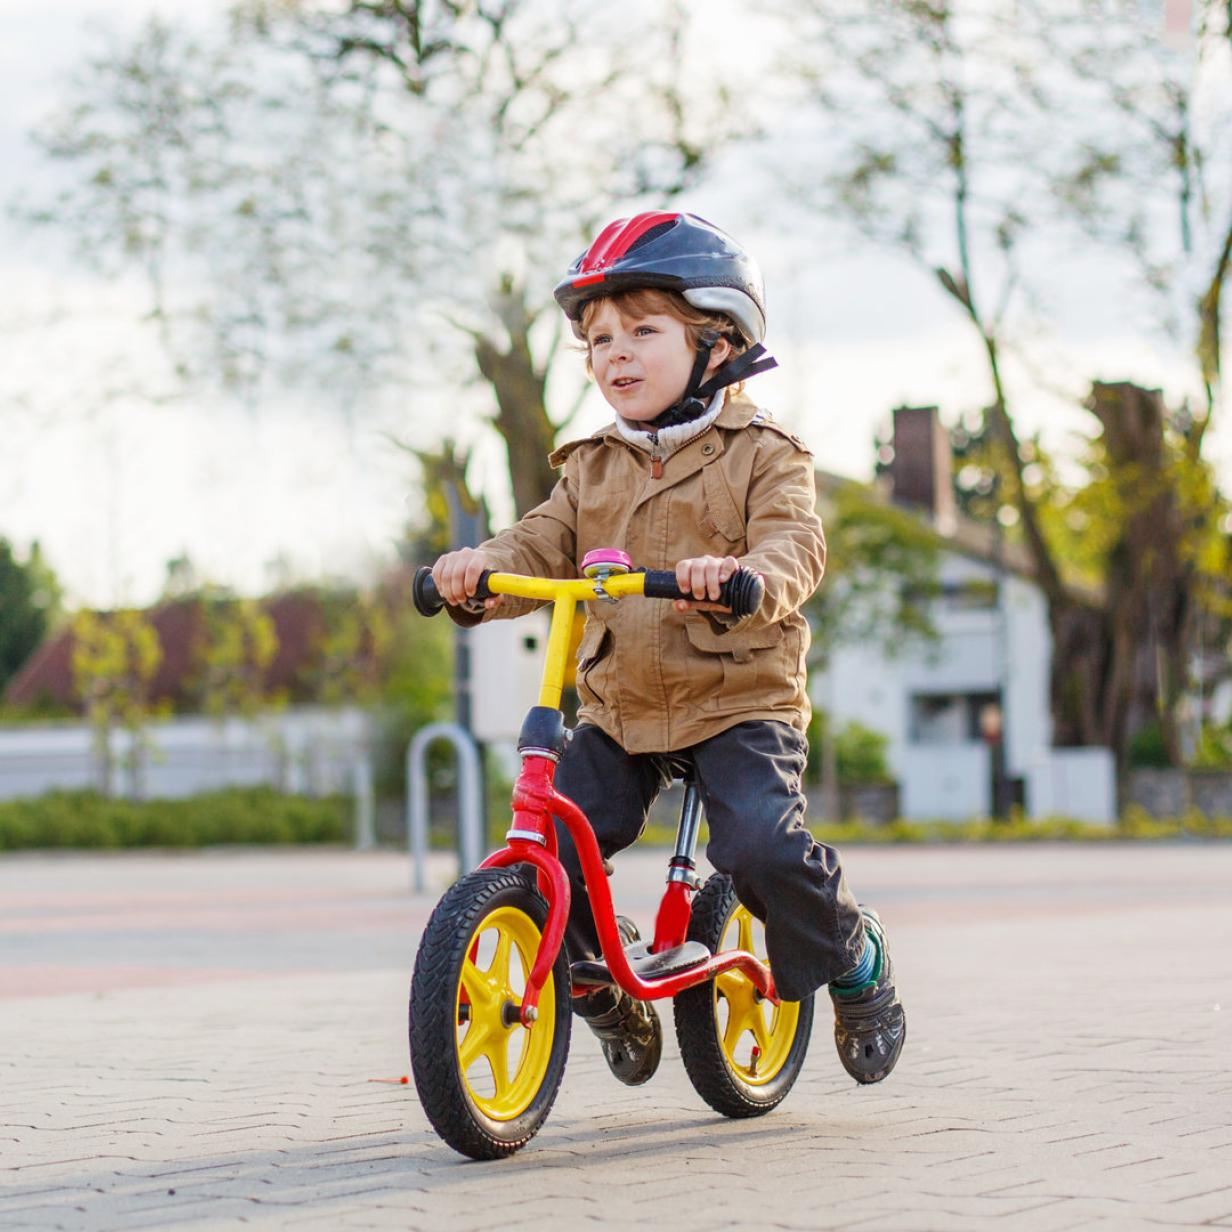 Lass los: Wie Kinder das Fahrradfahren lernen